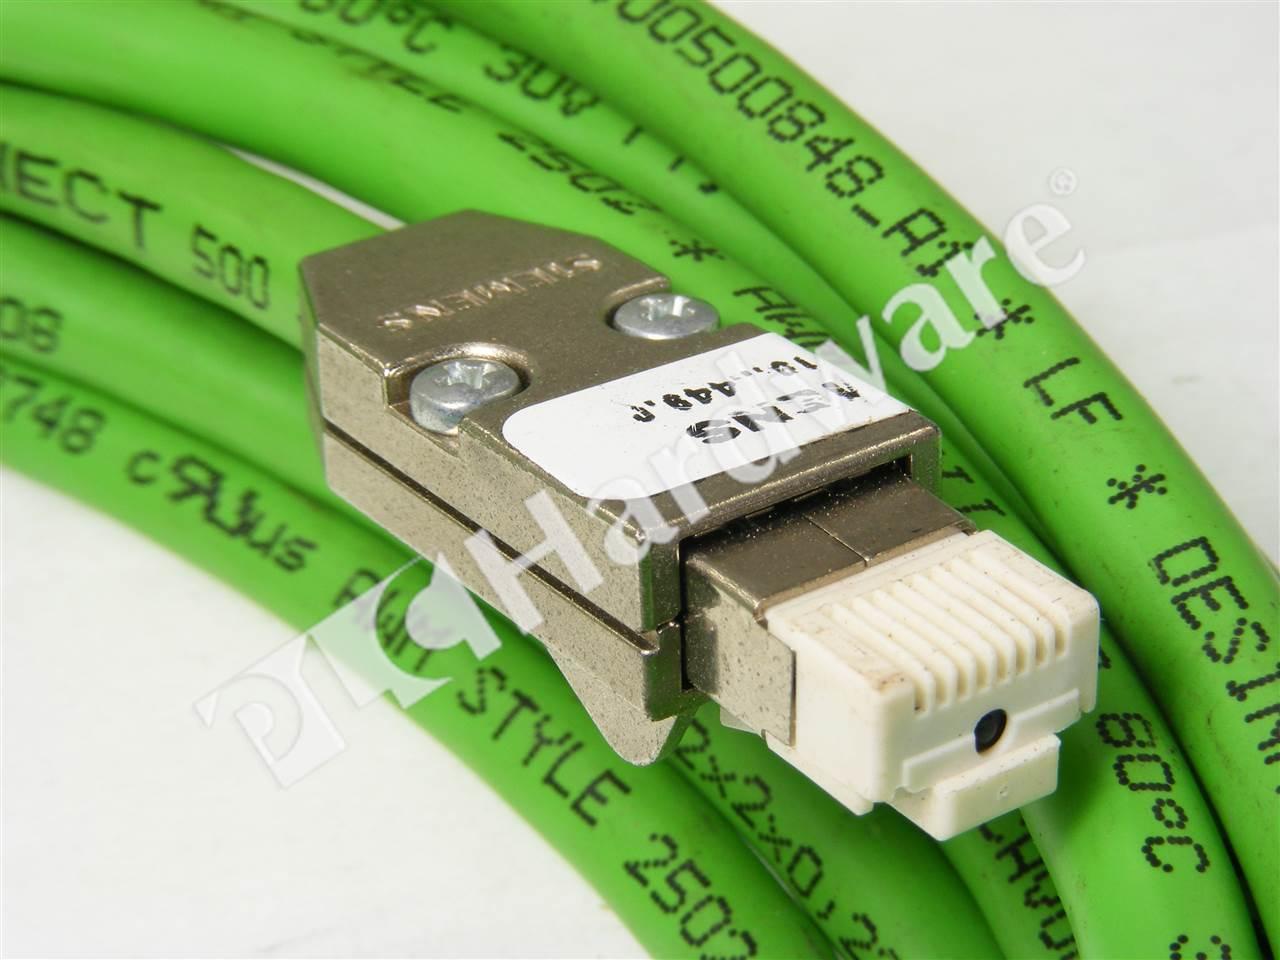 Siemens 6FX5002-2DC10-1AH0 Pre-Assembled Signal Cable